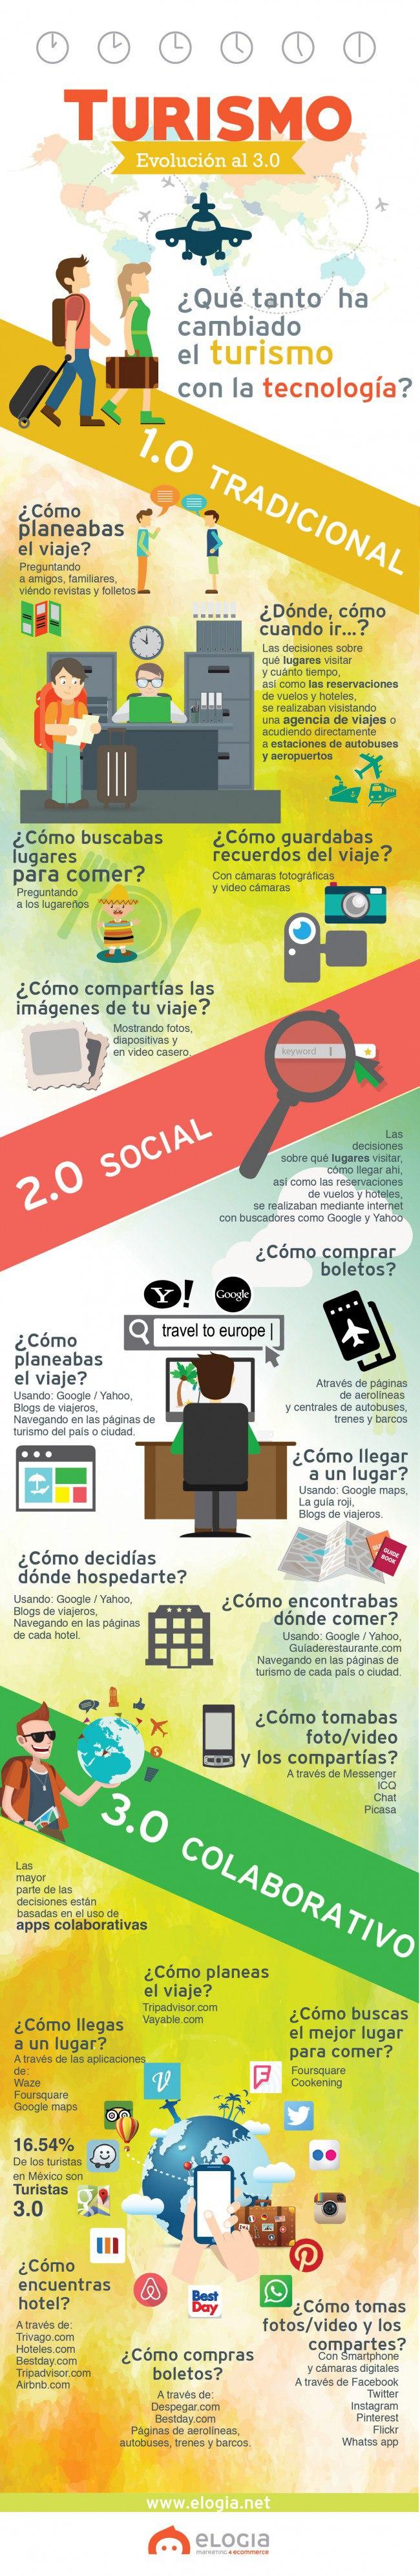 Infografía de Turista 3.0 Turismo online